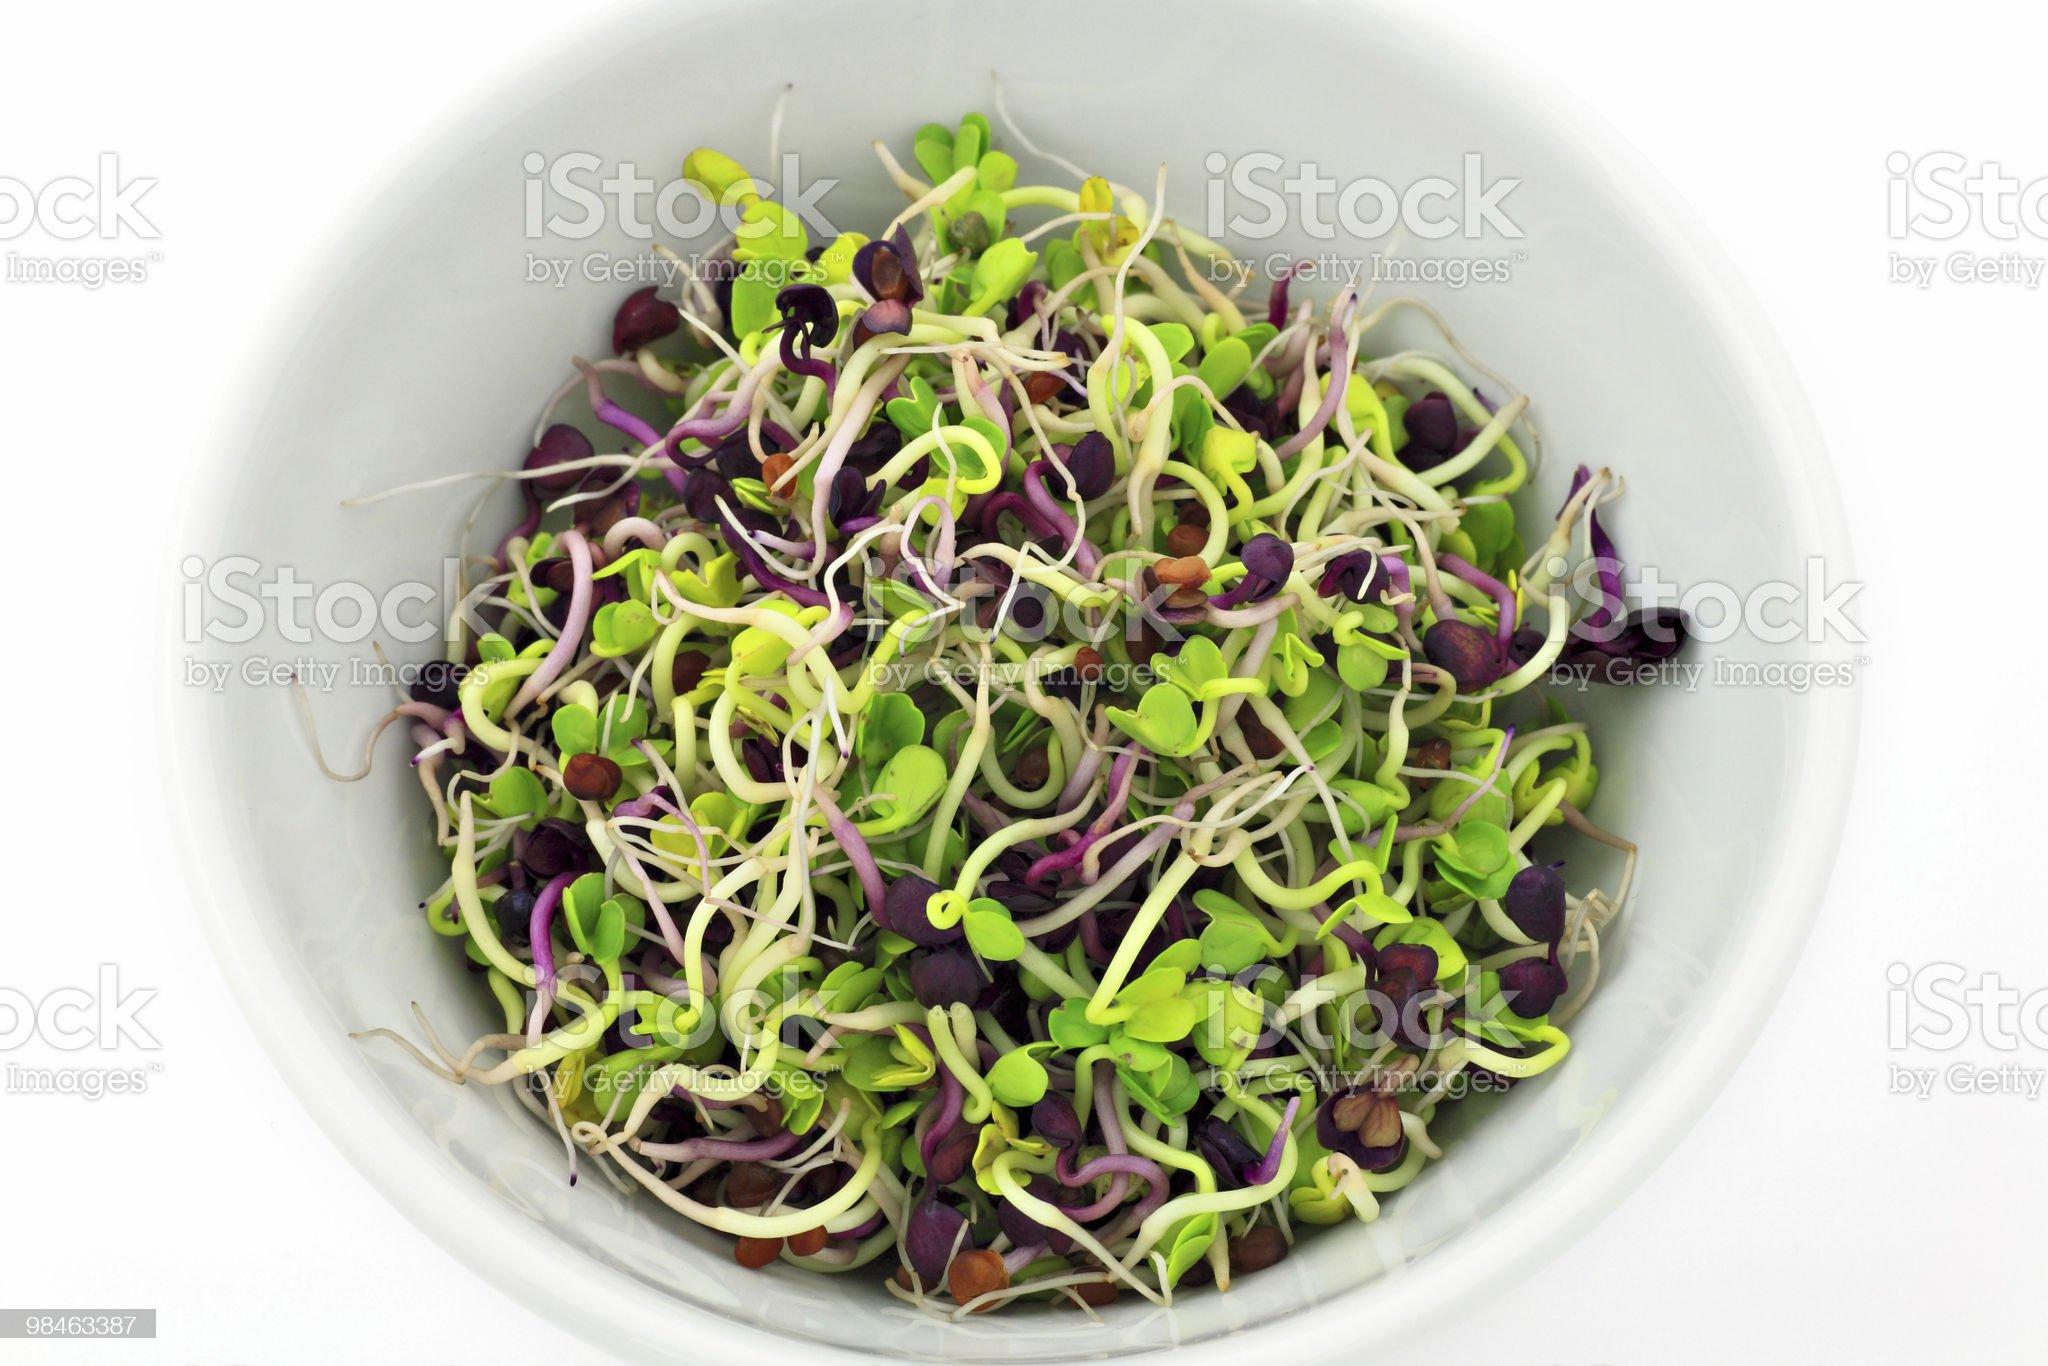 Radish sprouts royalty-free stock photo